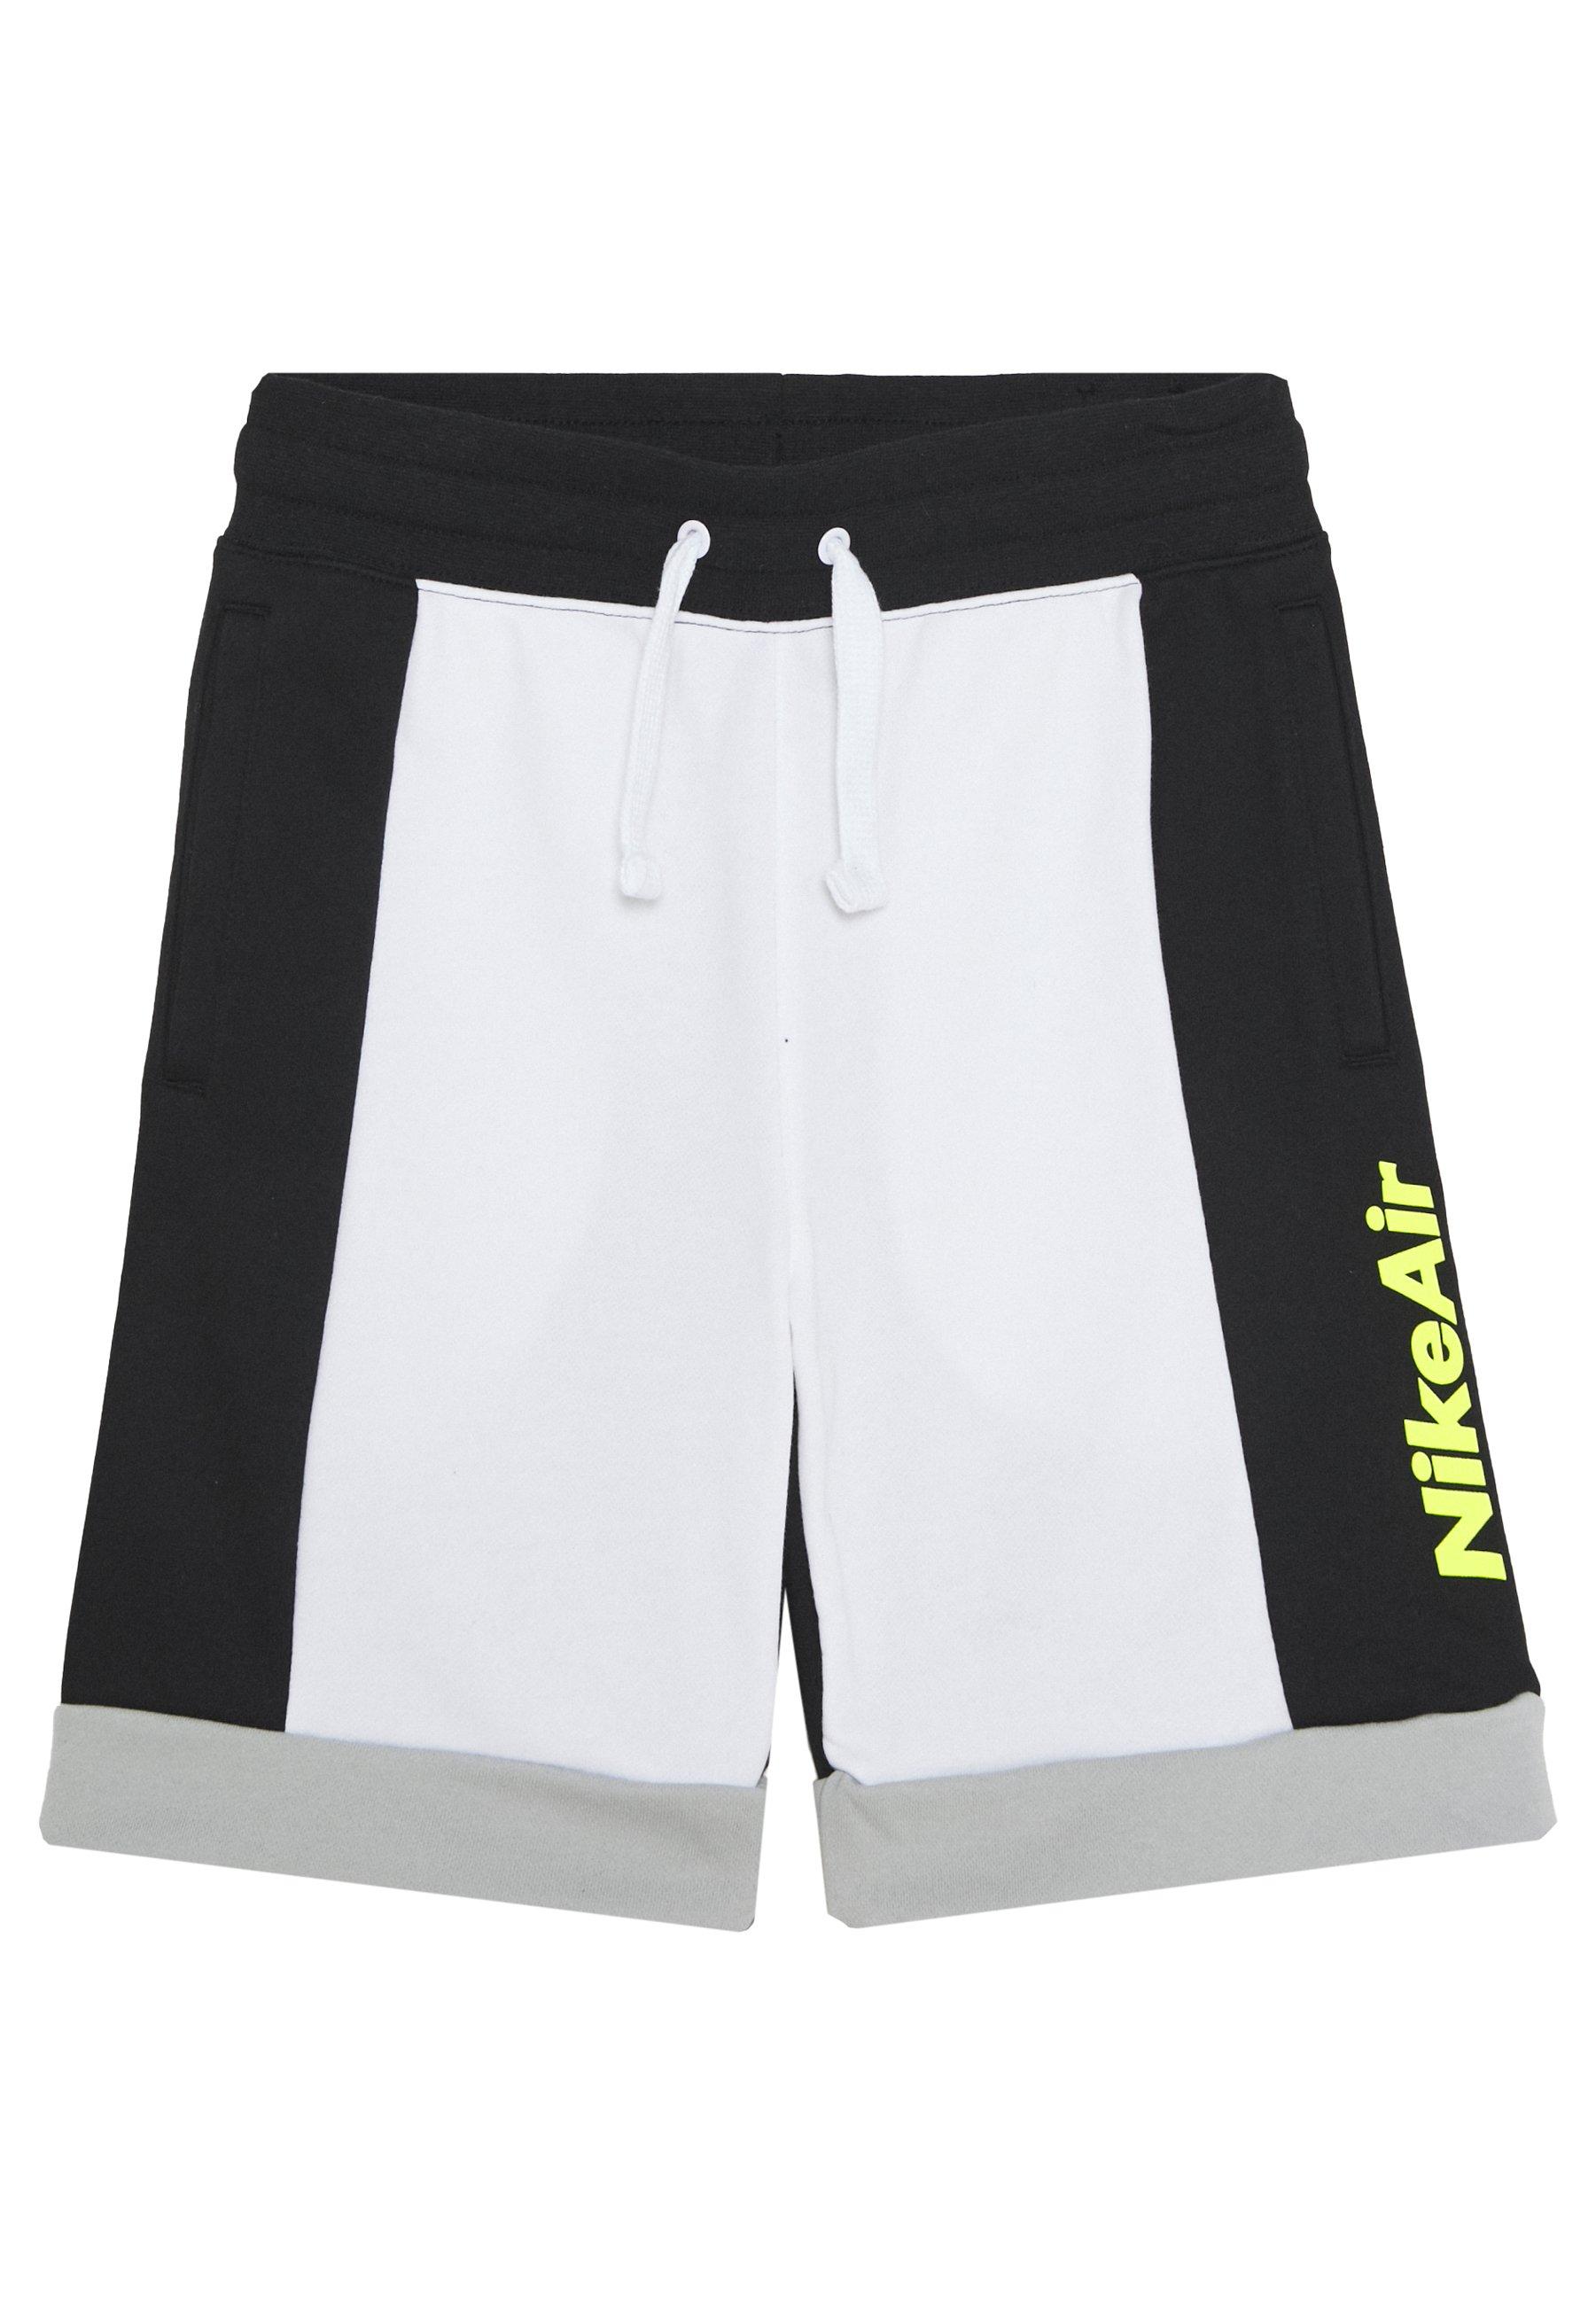 AIR Pantalon de survêtement whiteblacklight smoke greyvolt